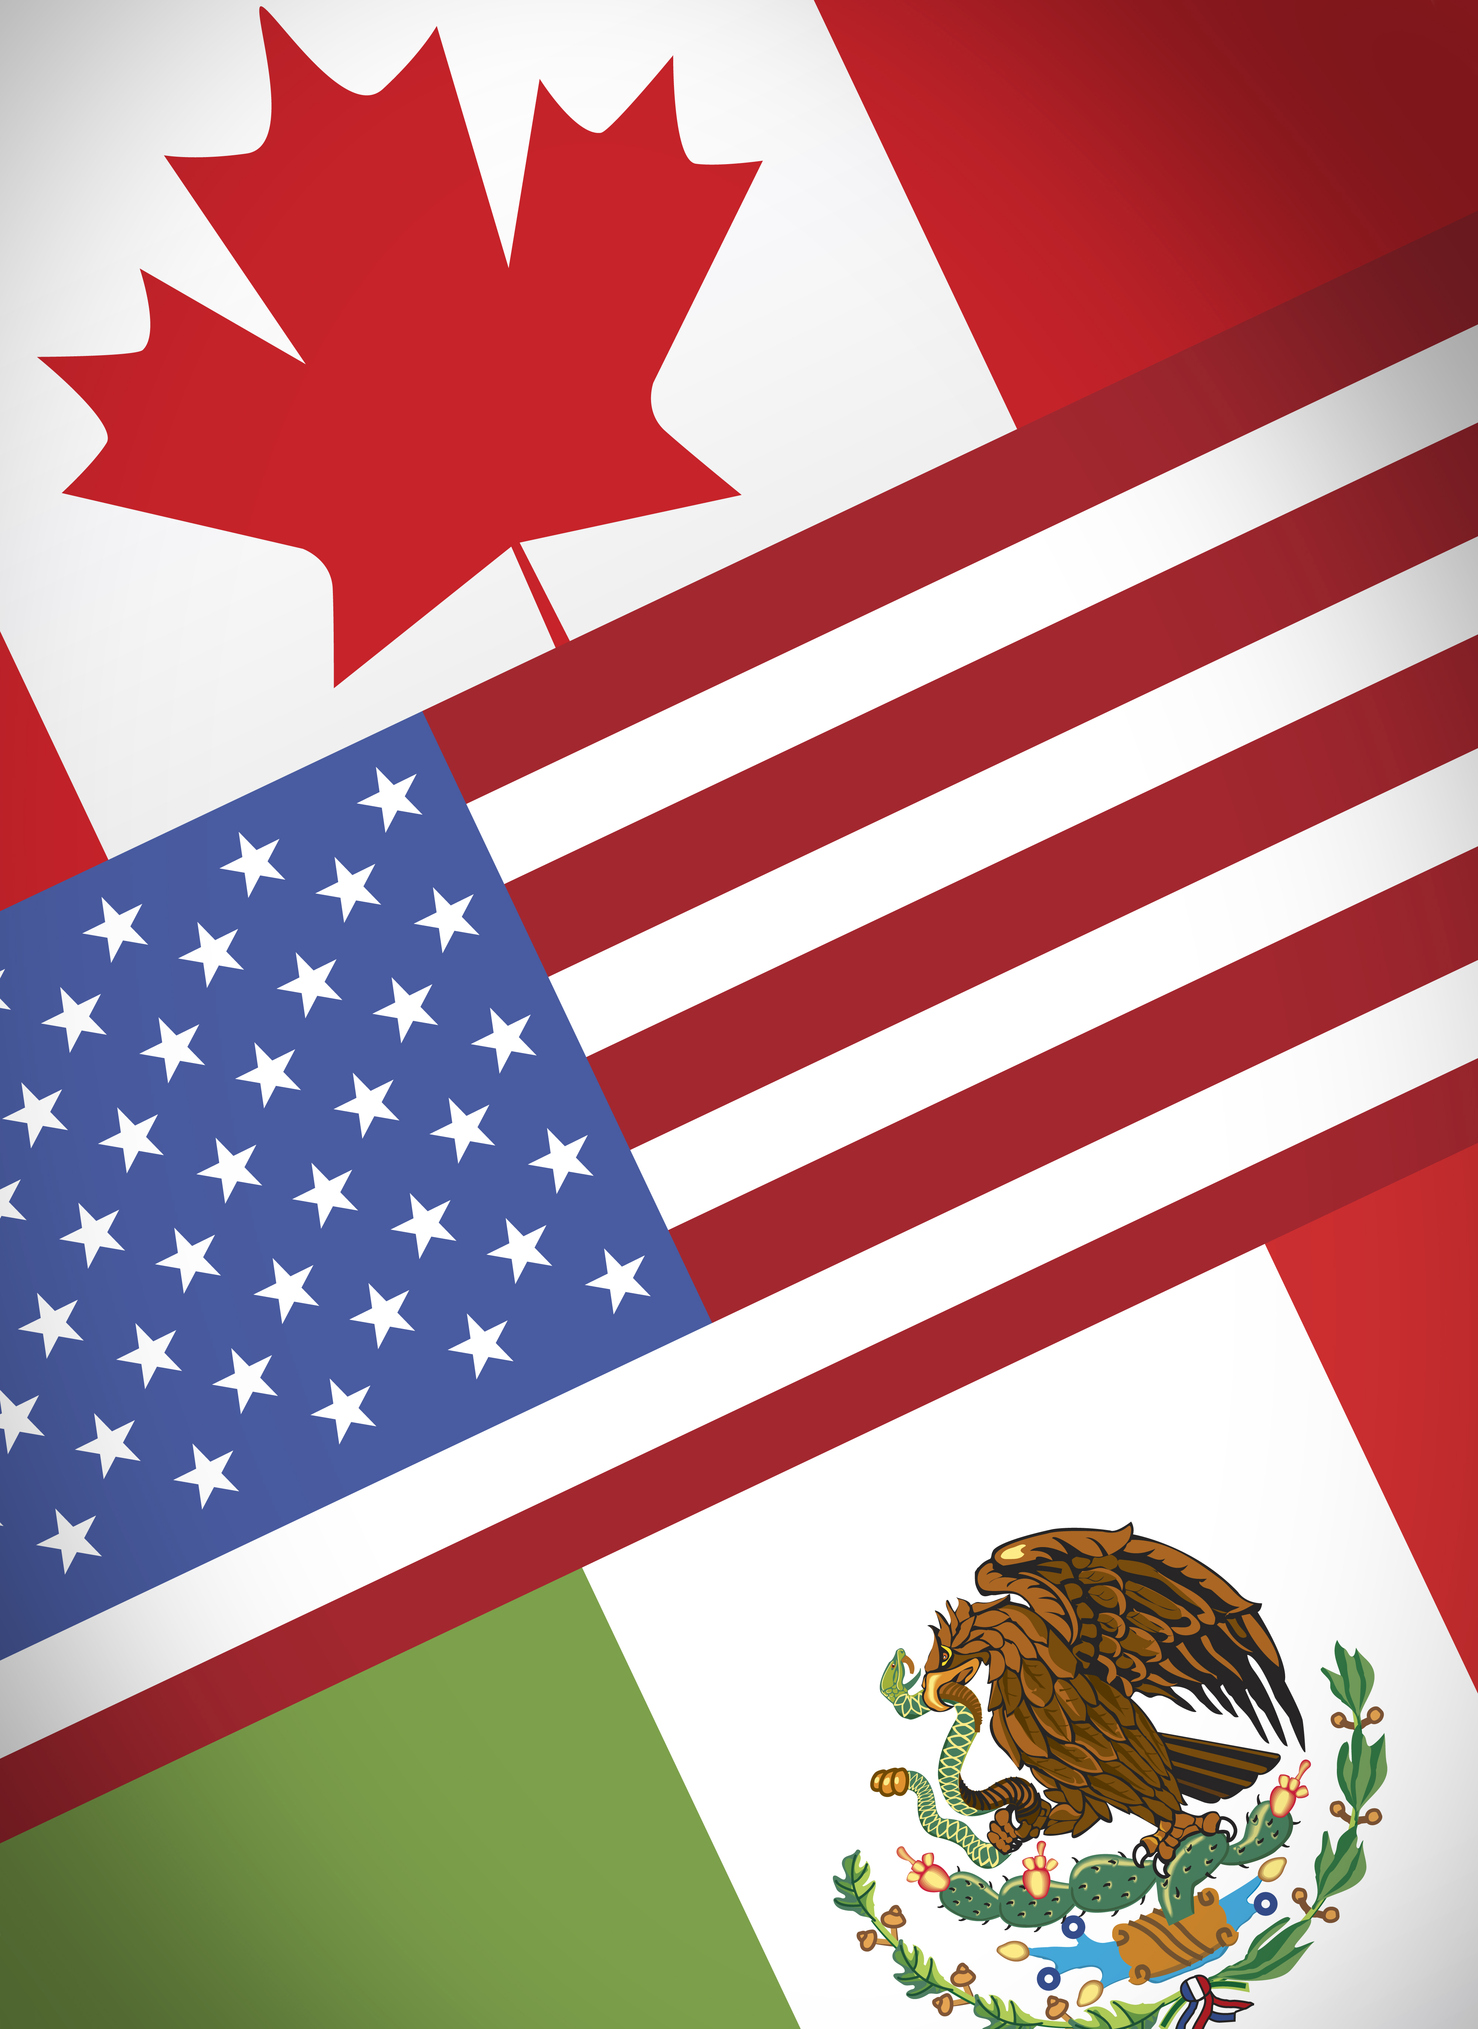 NAFTA-economical-trade-agreement-843466248_1480x2032.jpeg